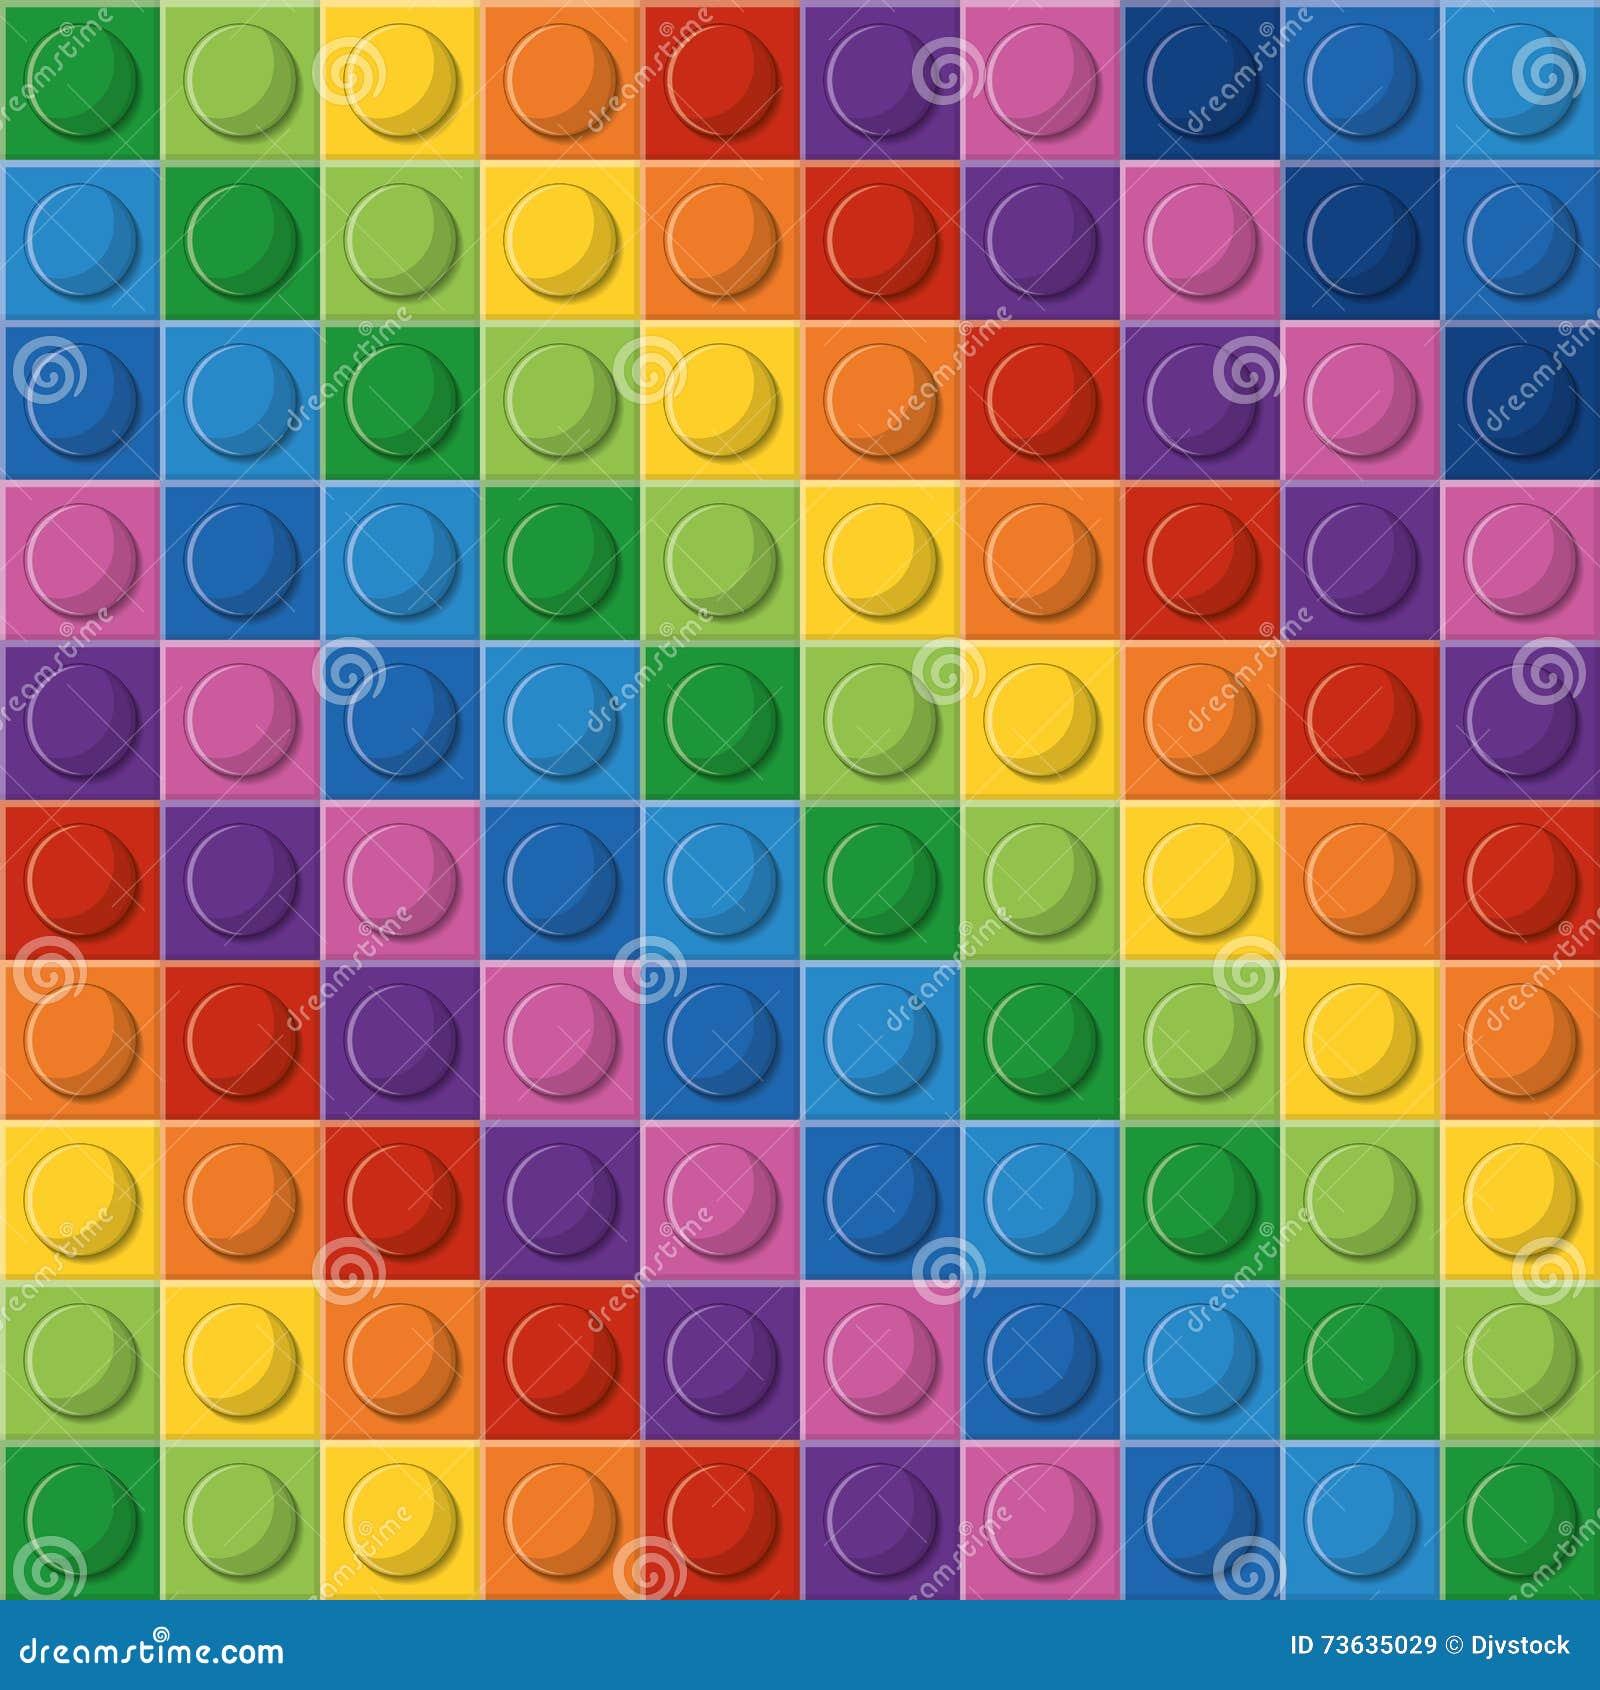 Lego icon. Abstract figure. Multicolored. Vector graphic